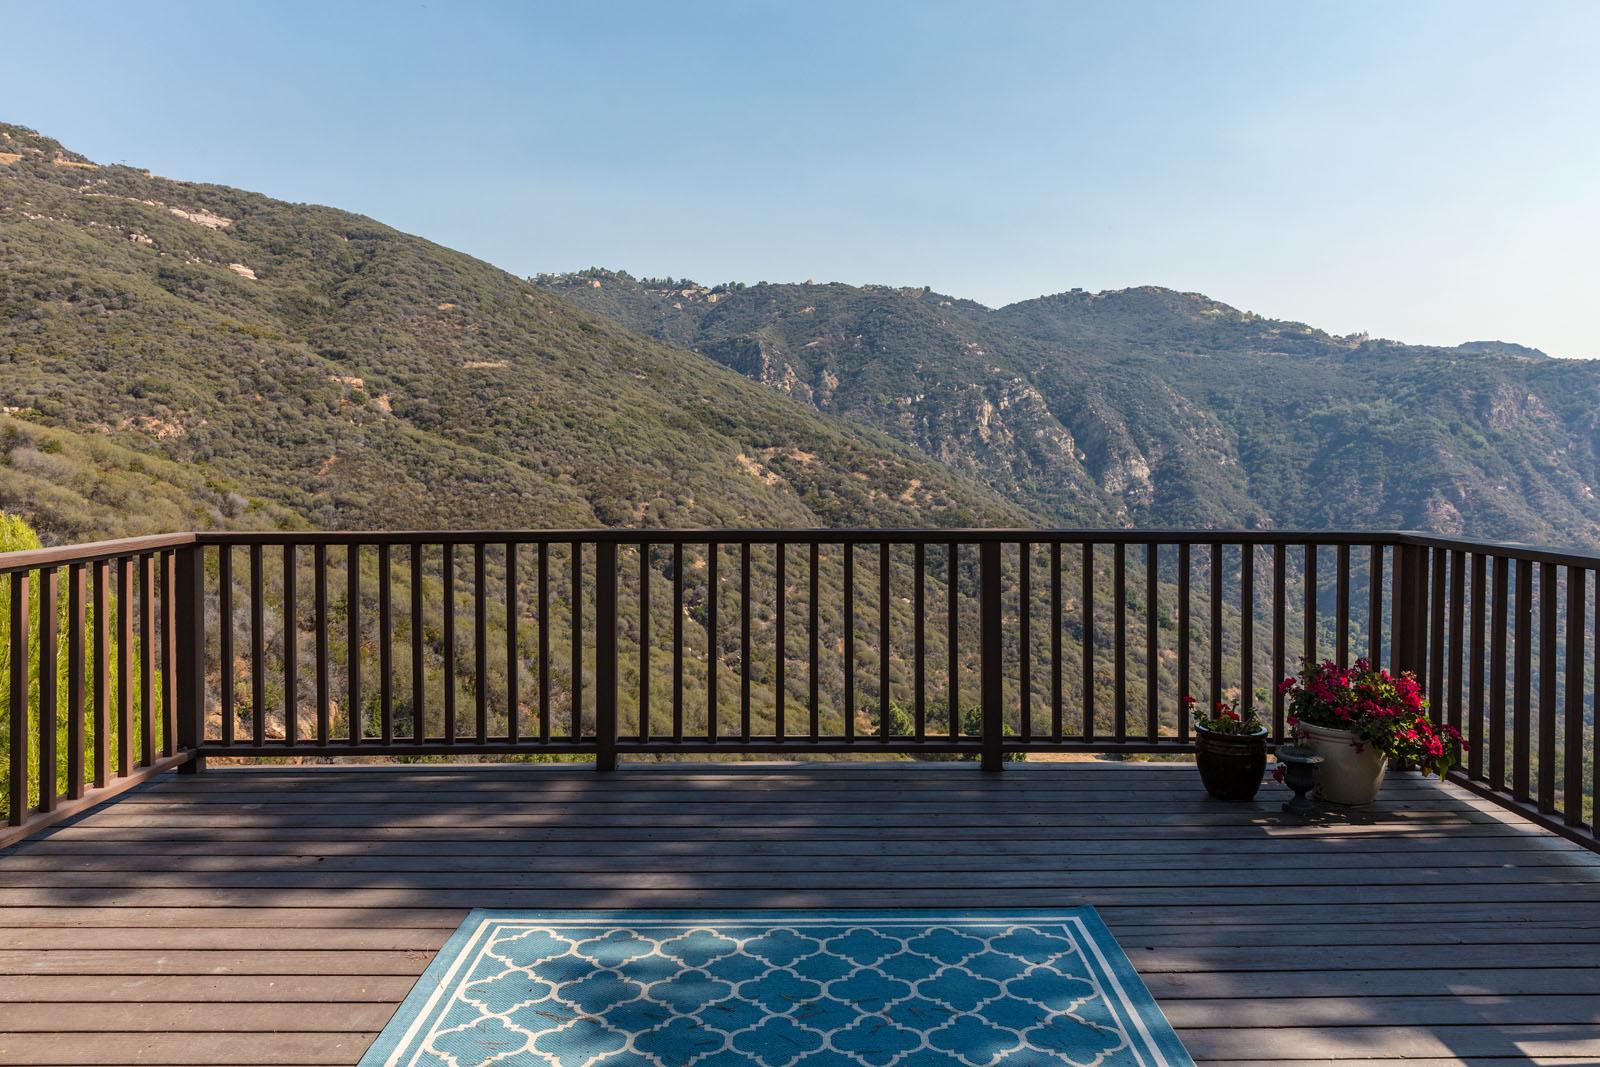 017 Deck 1712 Manzanita Park Avenue Malibu For Sale Lease The Malibu Life Team Luxury Real Estate.jpg